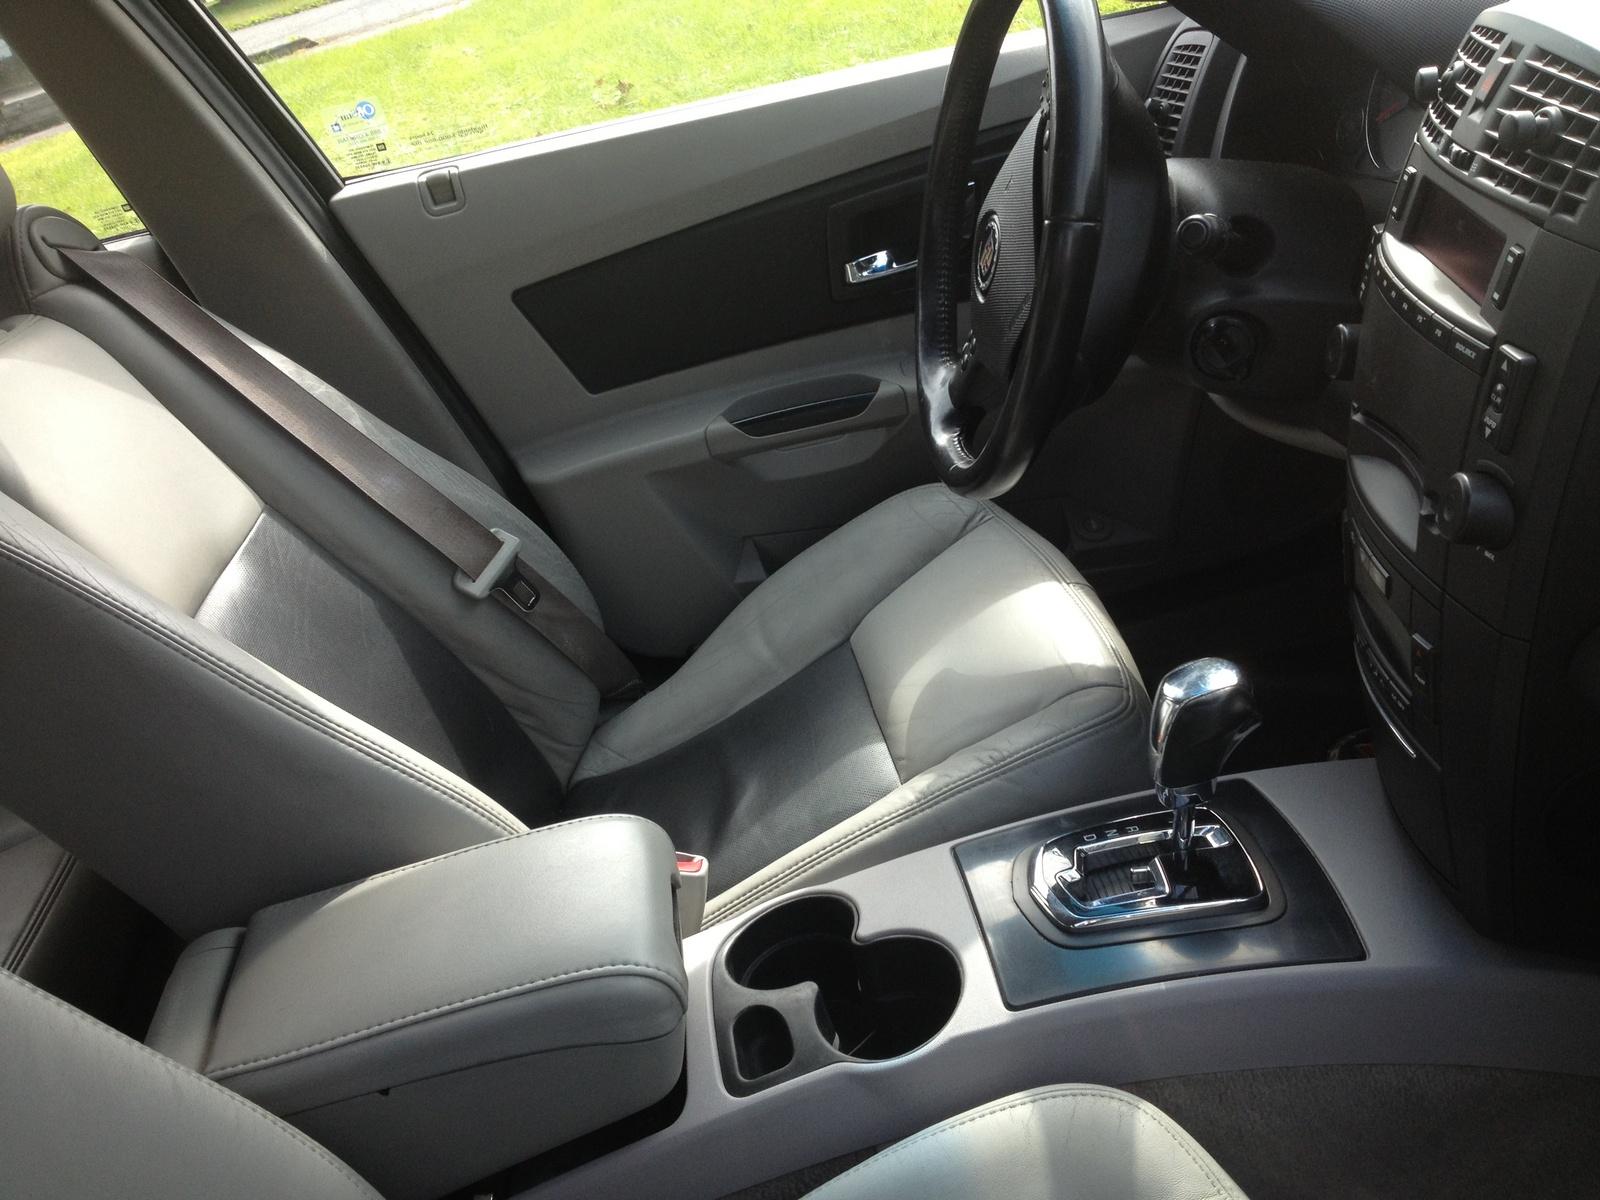 2007 cadillac cts interior pictures cargurus - Cadillac cts interior accessories ...